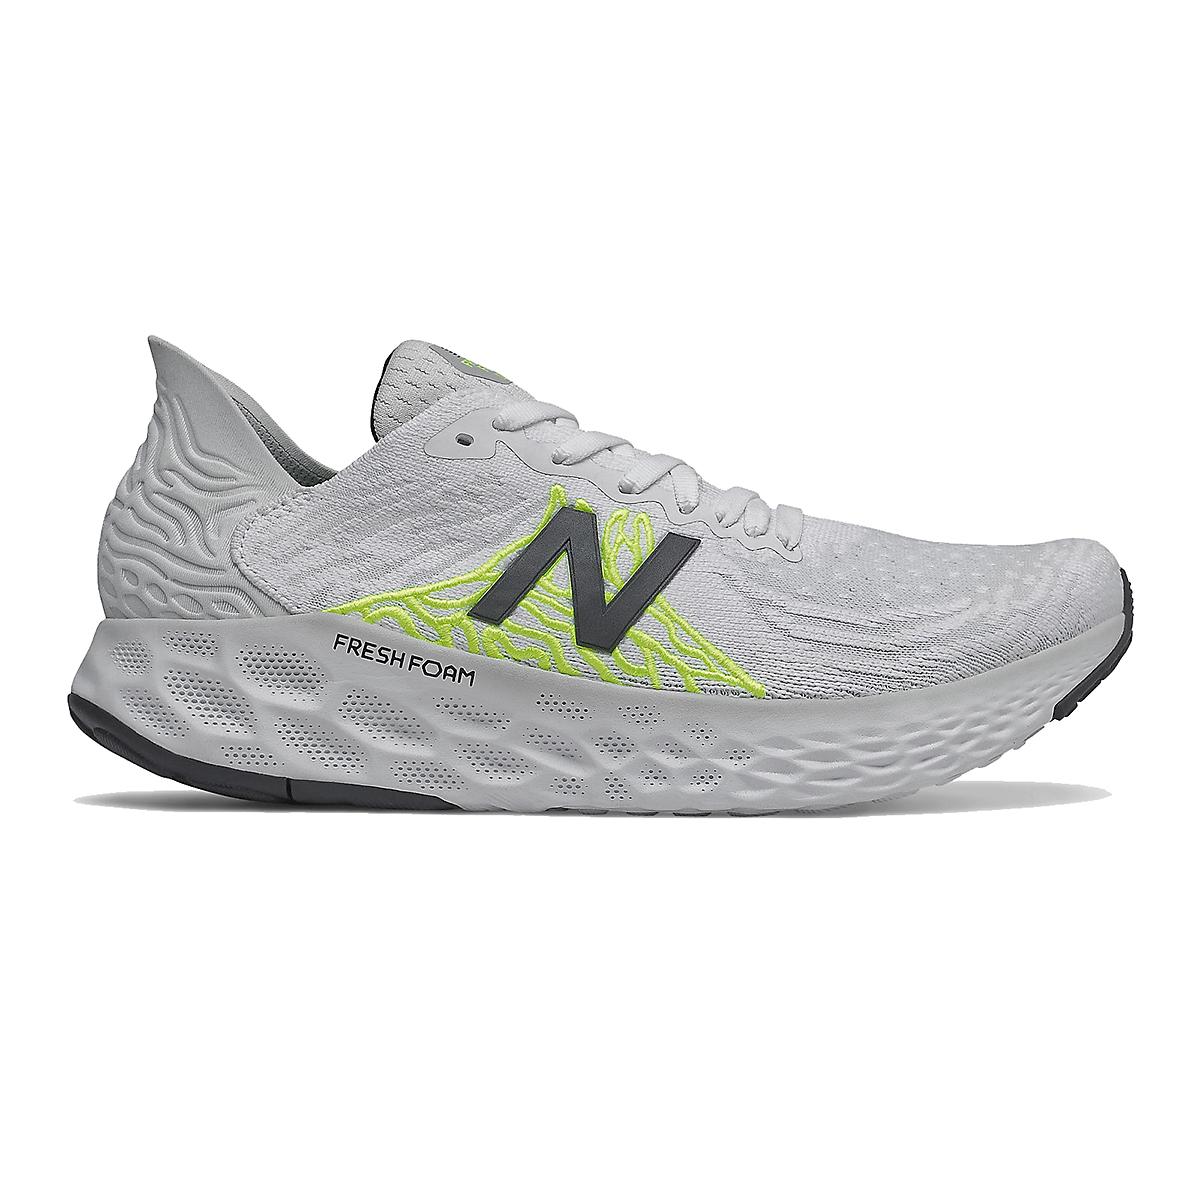 Women's New Balance Fresh Foam 1080v10 Running Shoe - Color: Light Aluminum - Size: 5.5 - Width: Extra Wide, Light Aluminum, large, image 1